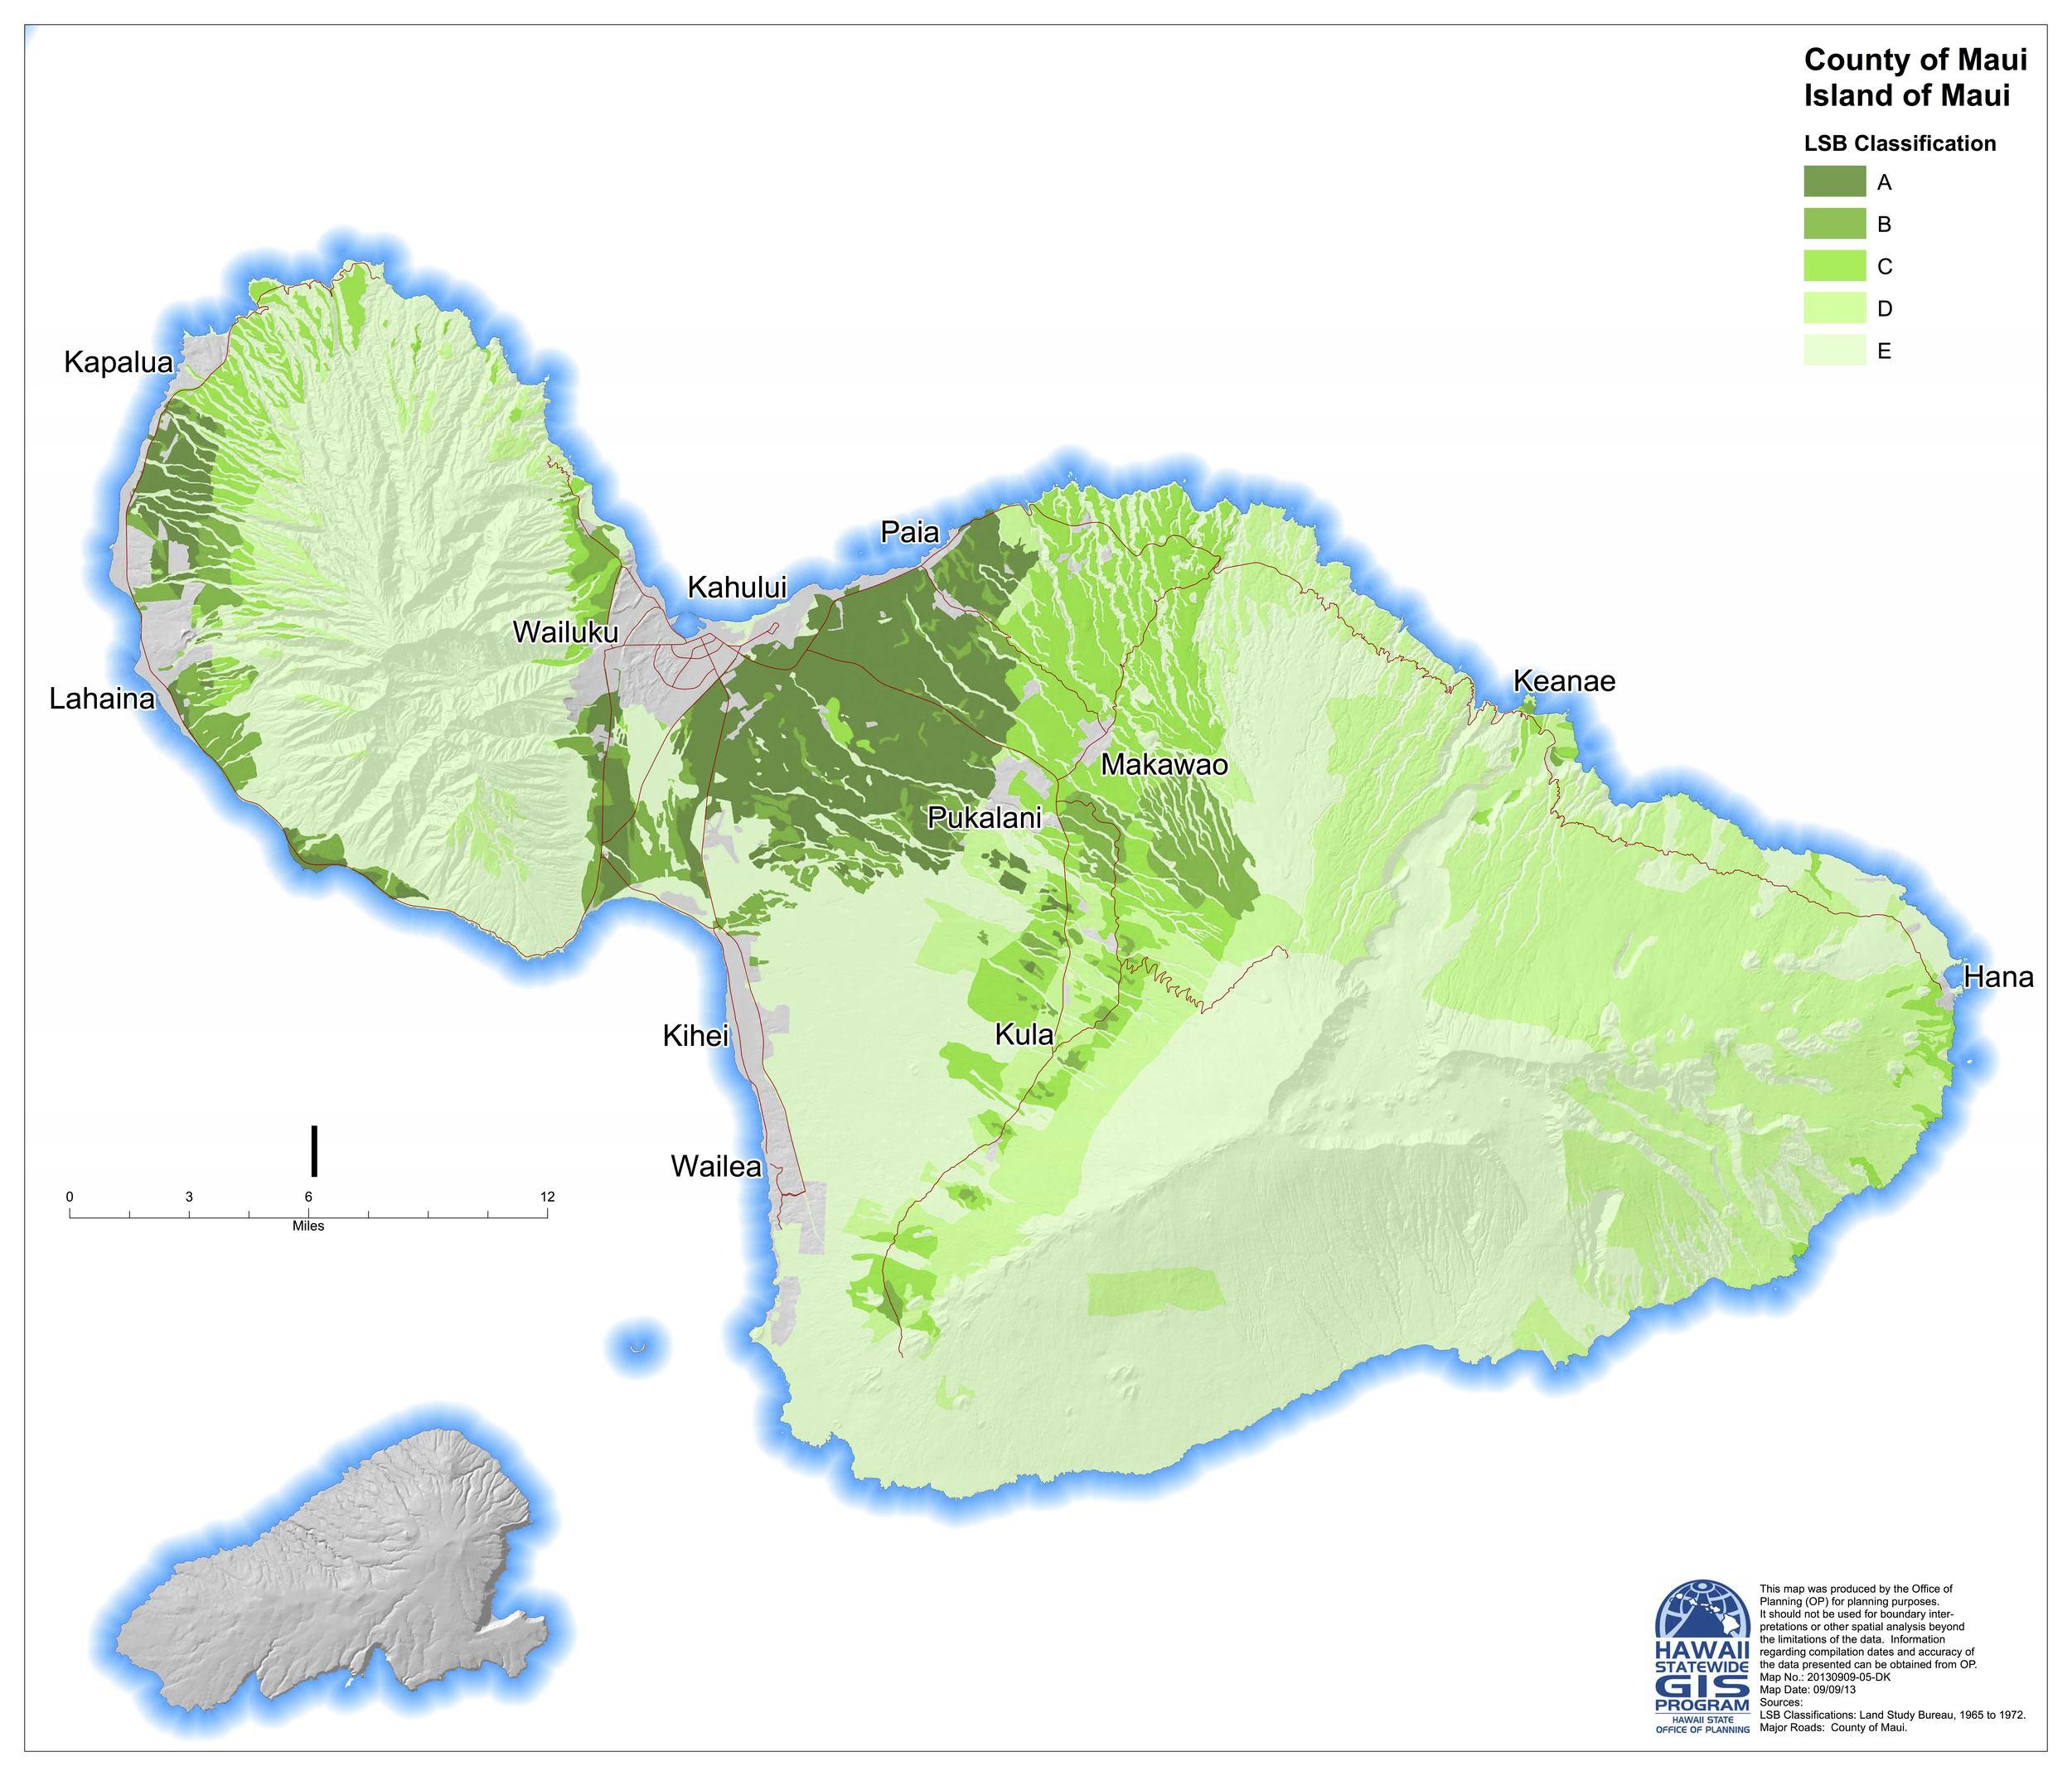 dbedt gis map of LSB  classification (2).jpg